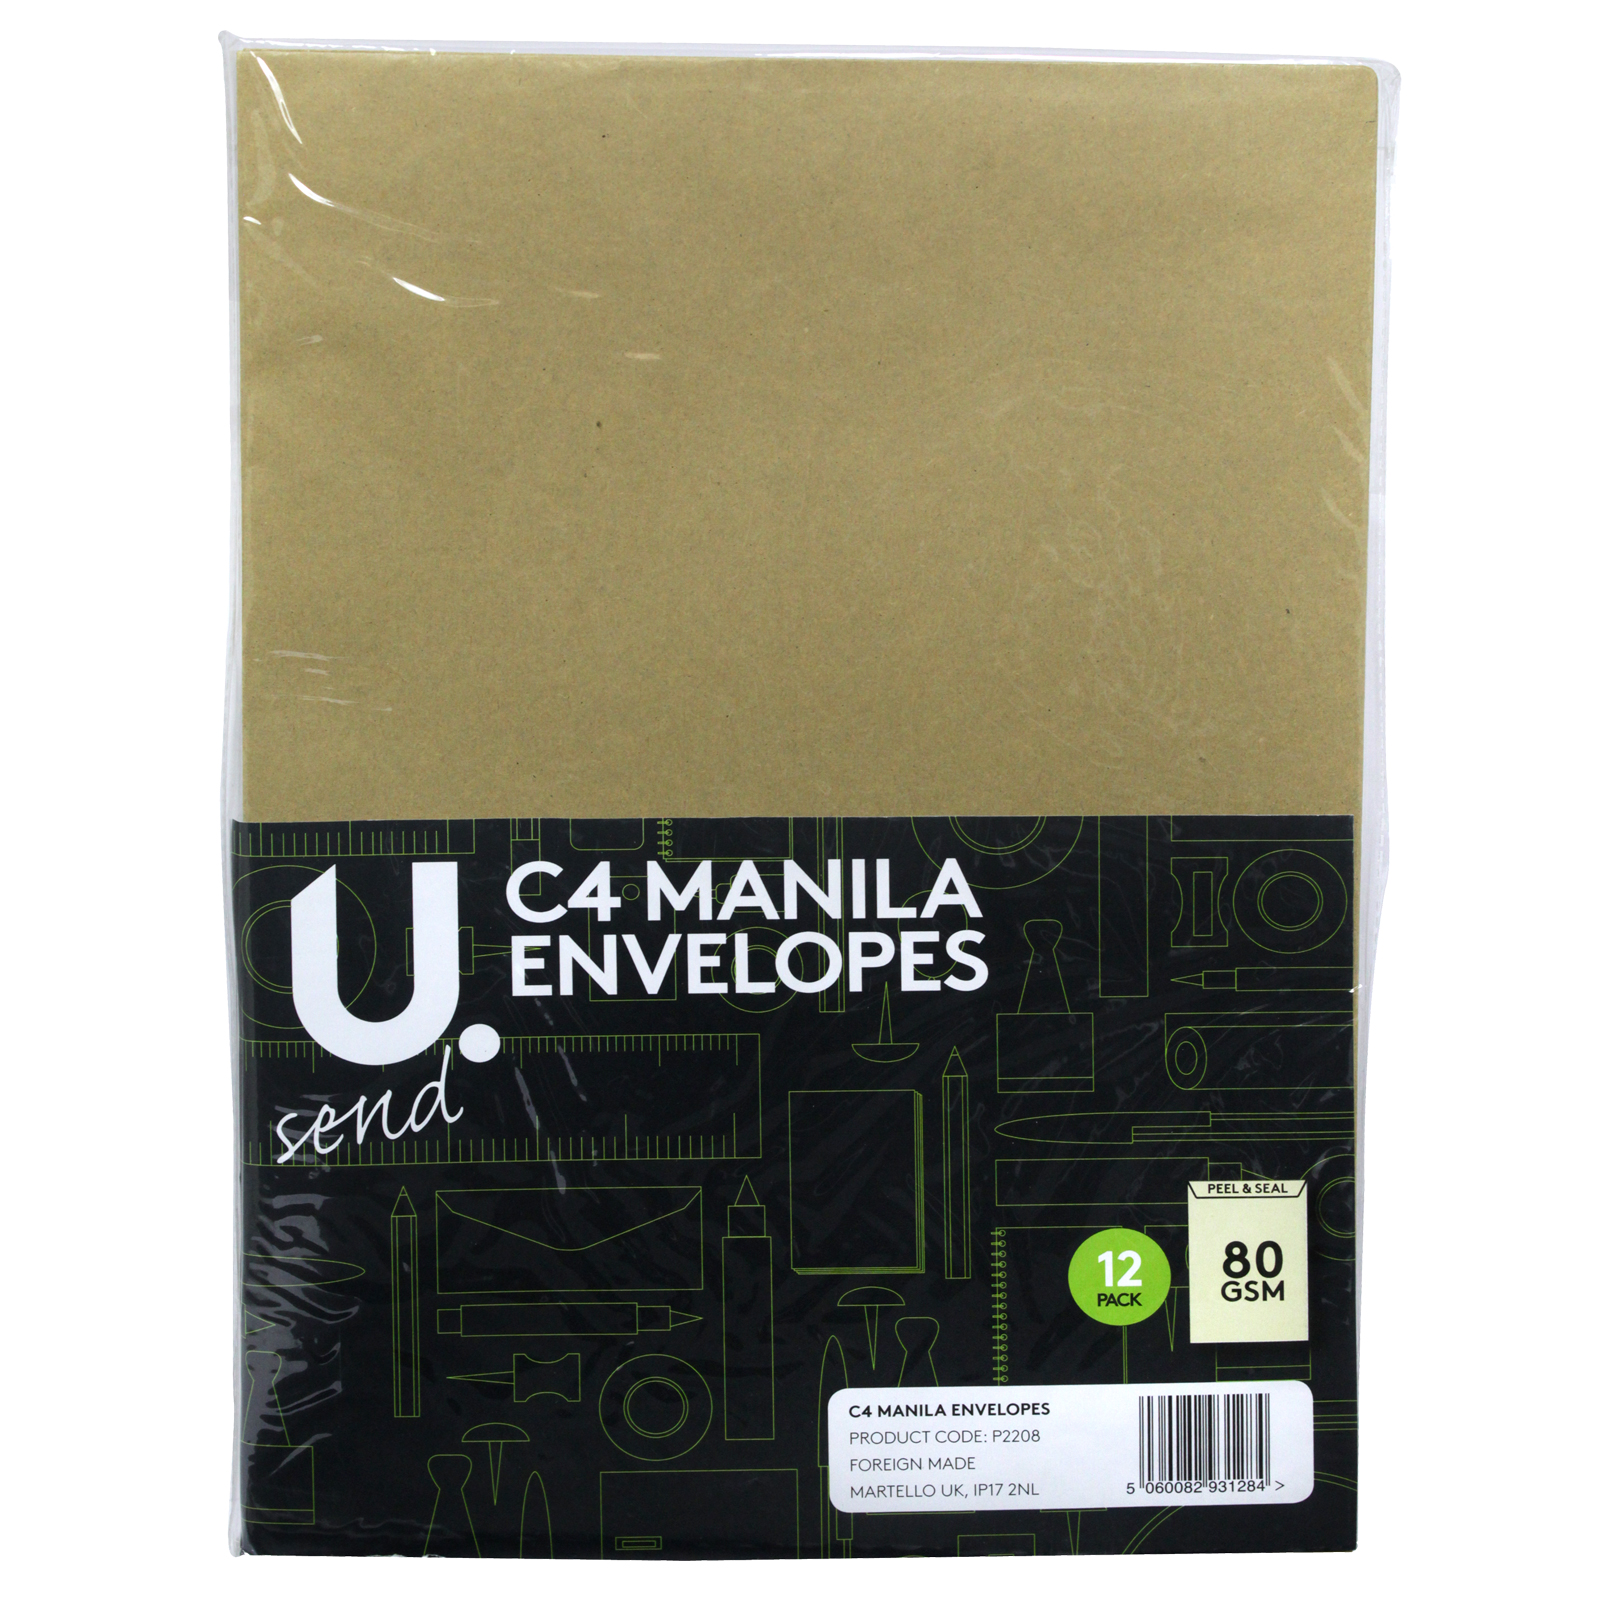 PENNINE ENVELOPES C4X12PK MANILA X12